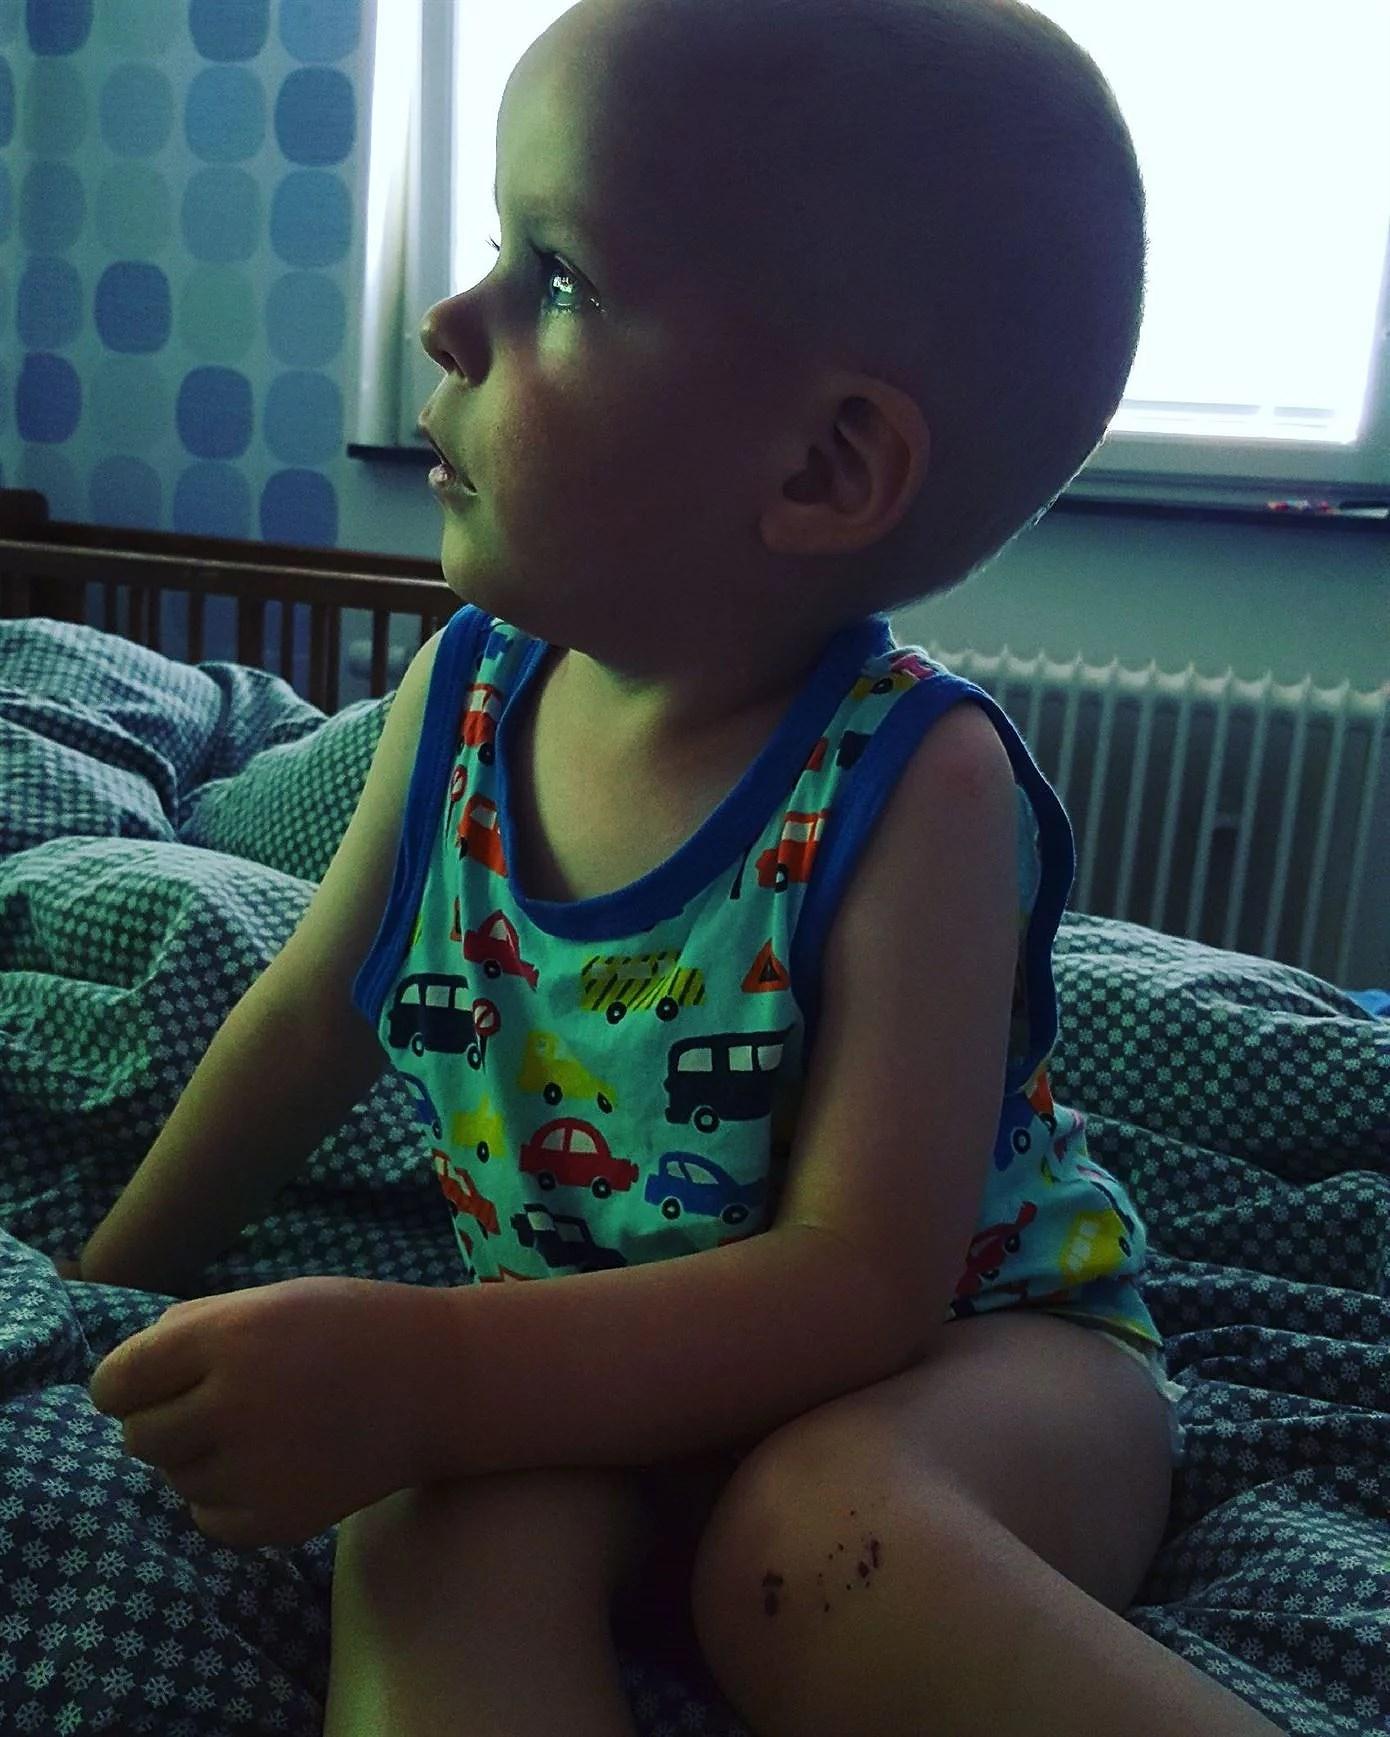 Barnen sjuka